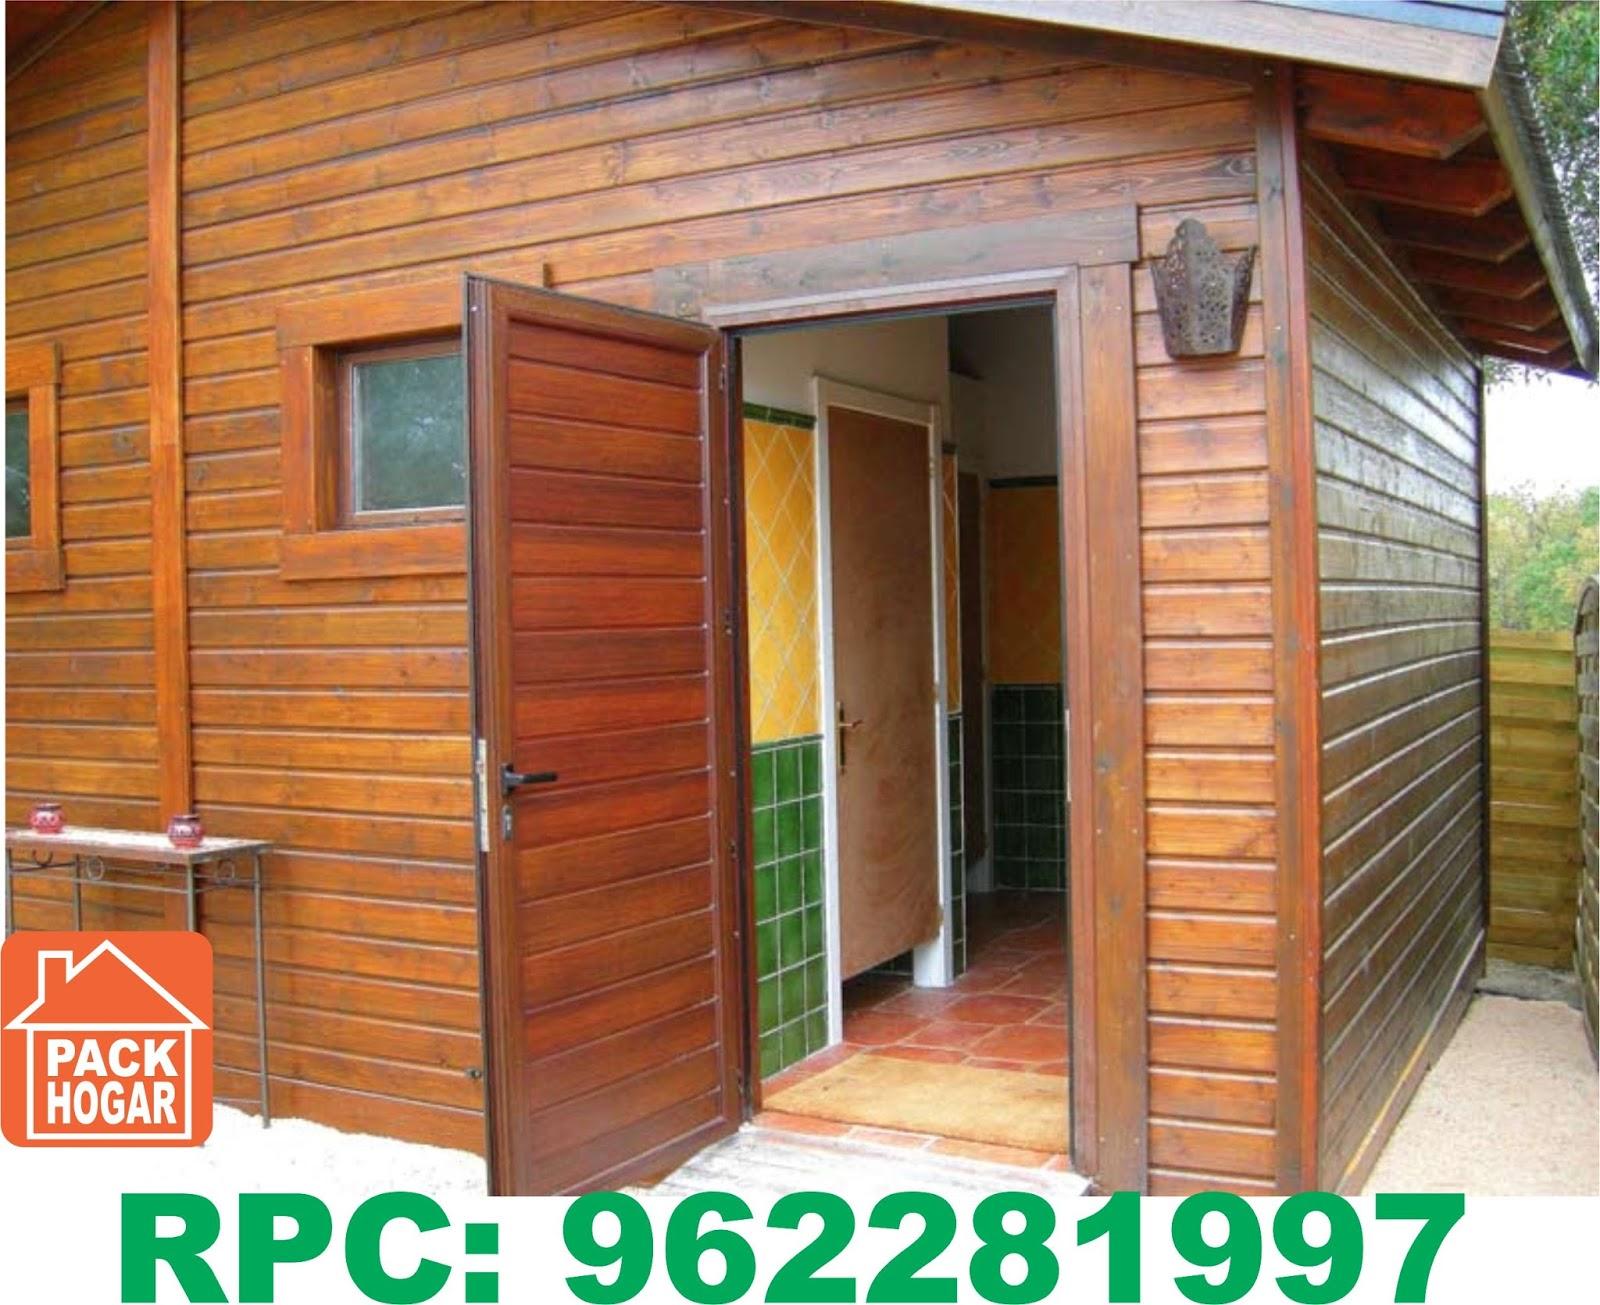 Casetas modulos prefabricadas de madera for Casas y casetas prefabricadas